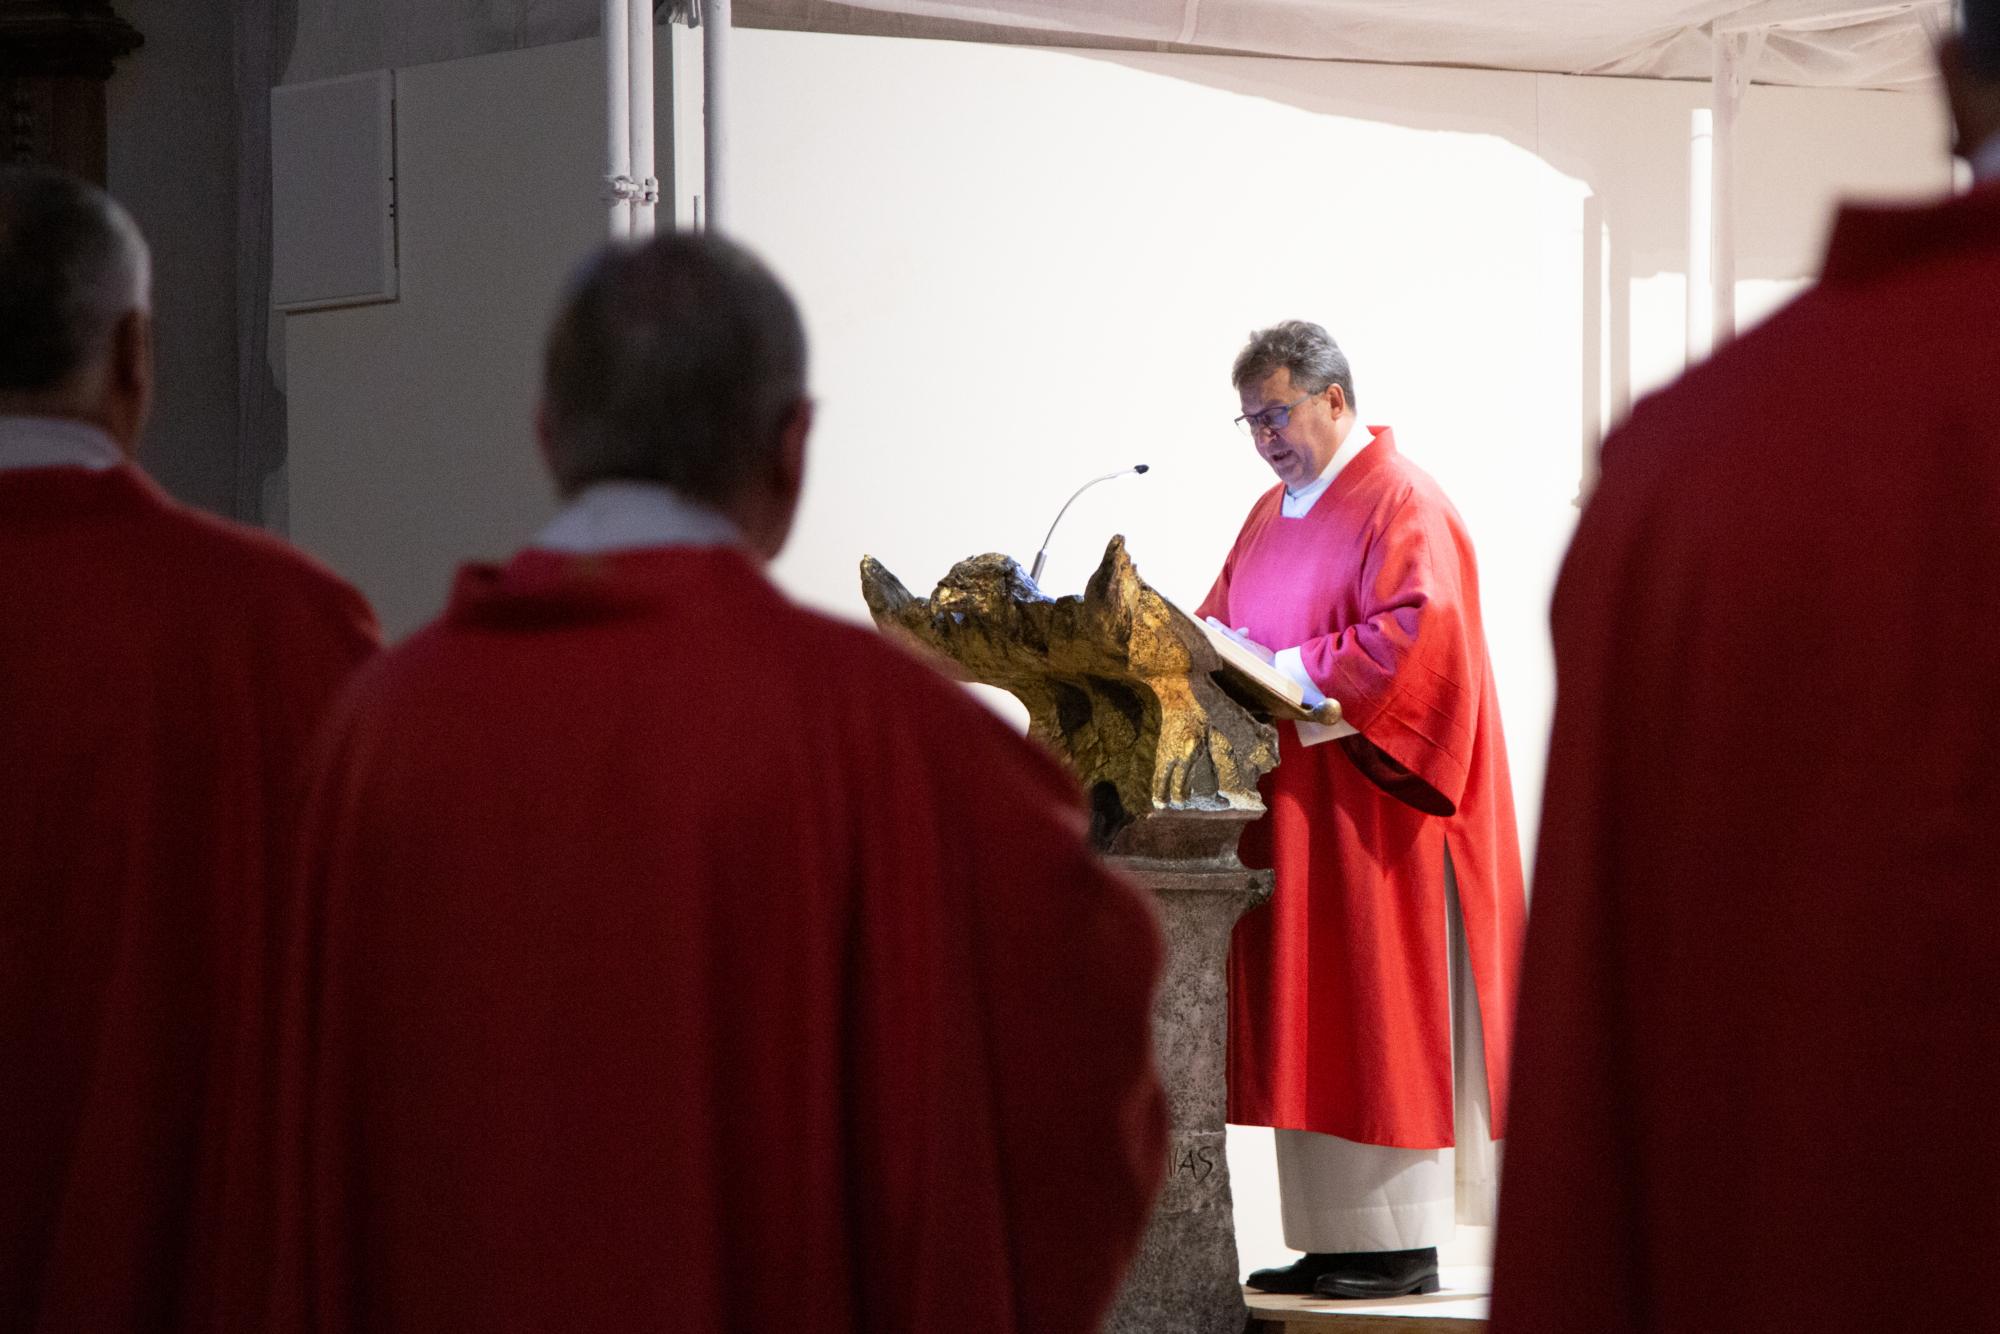 211012 Pontifikalamt Maximilian 2